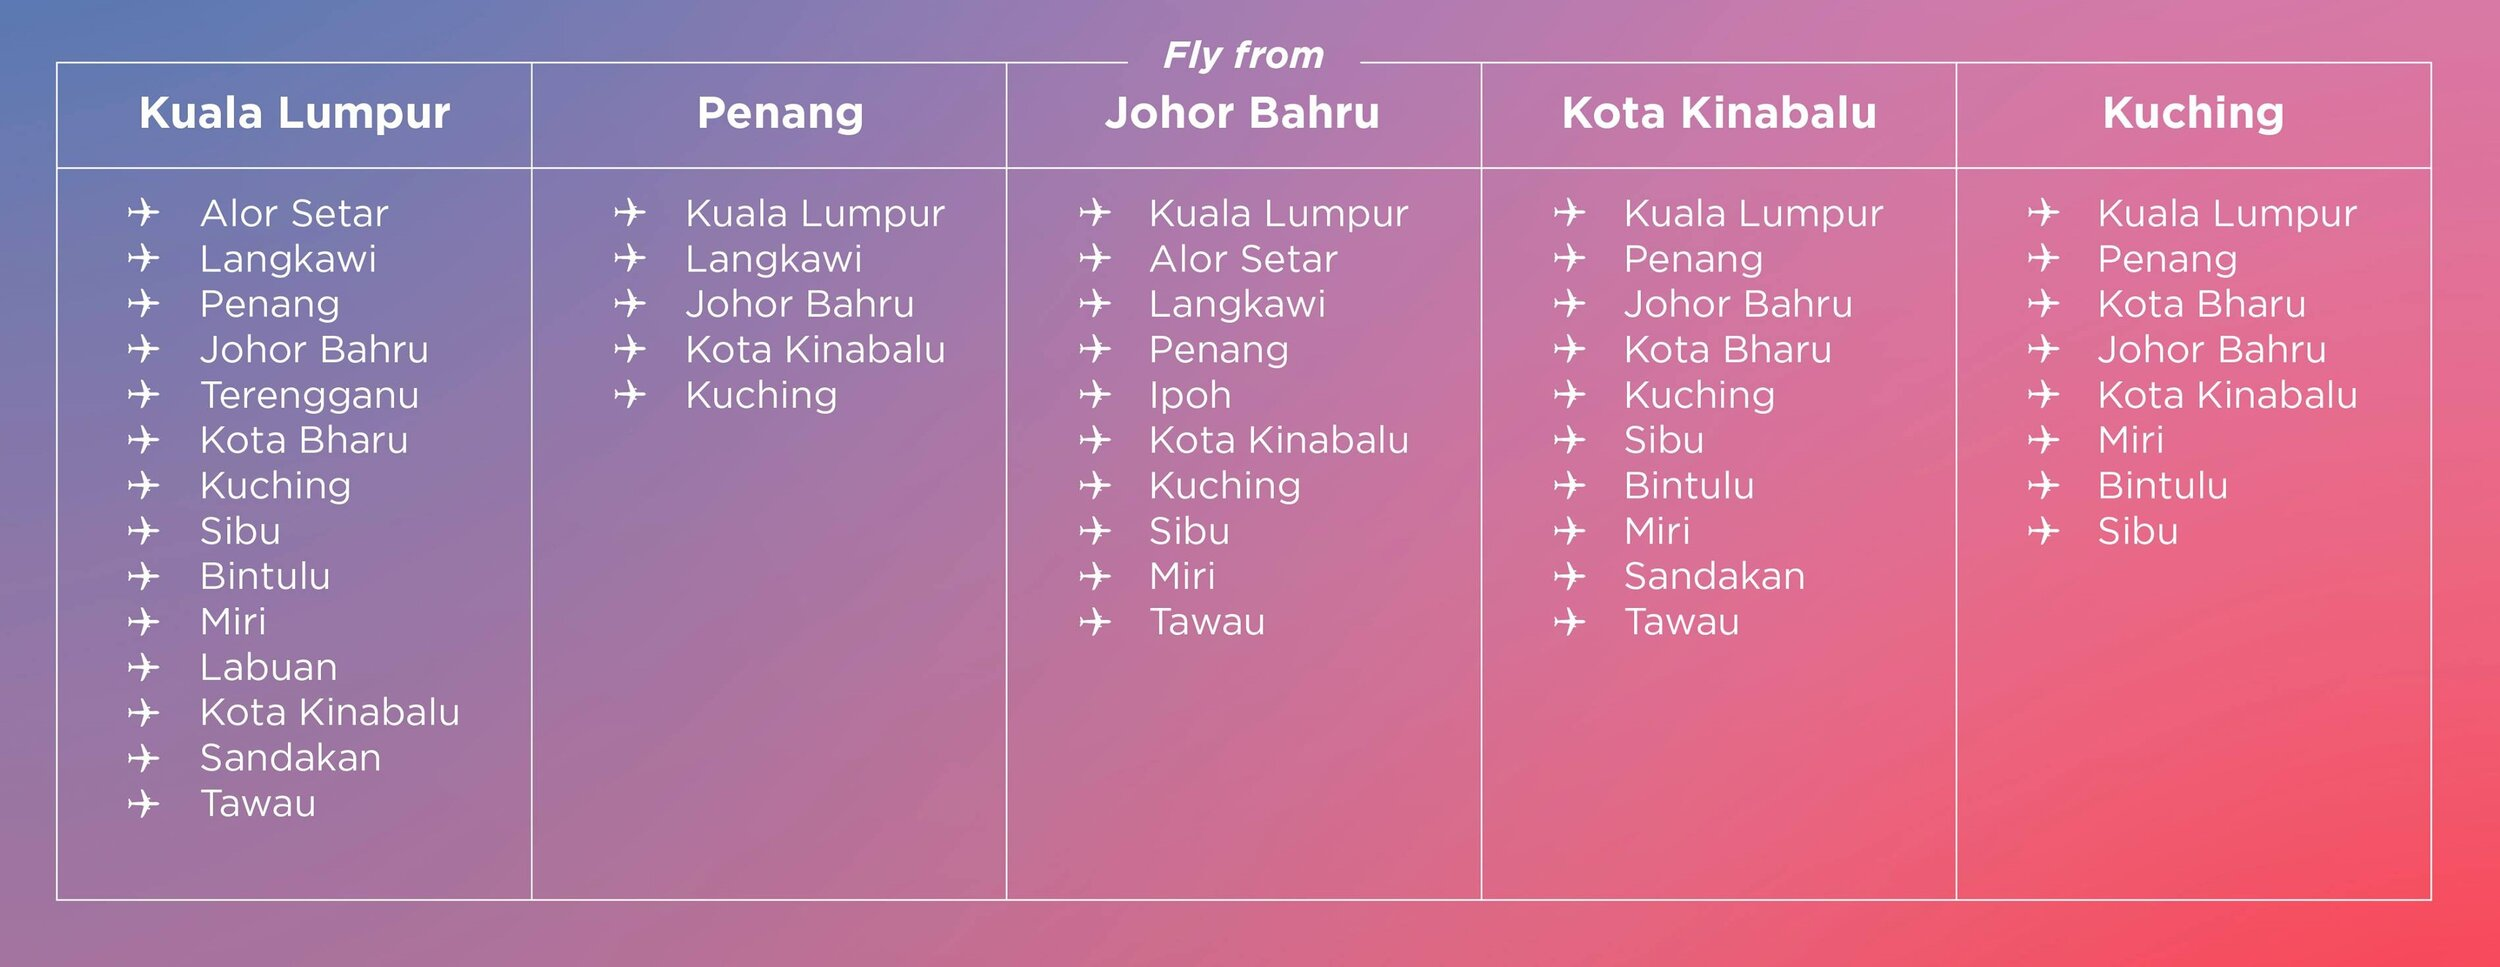 AirAsia Unlimited Pass Cuti-Cuti Malaysia - Destinations - Edited.jpg